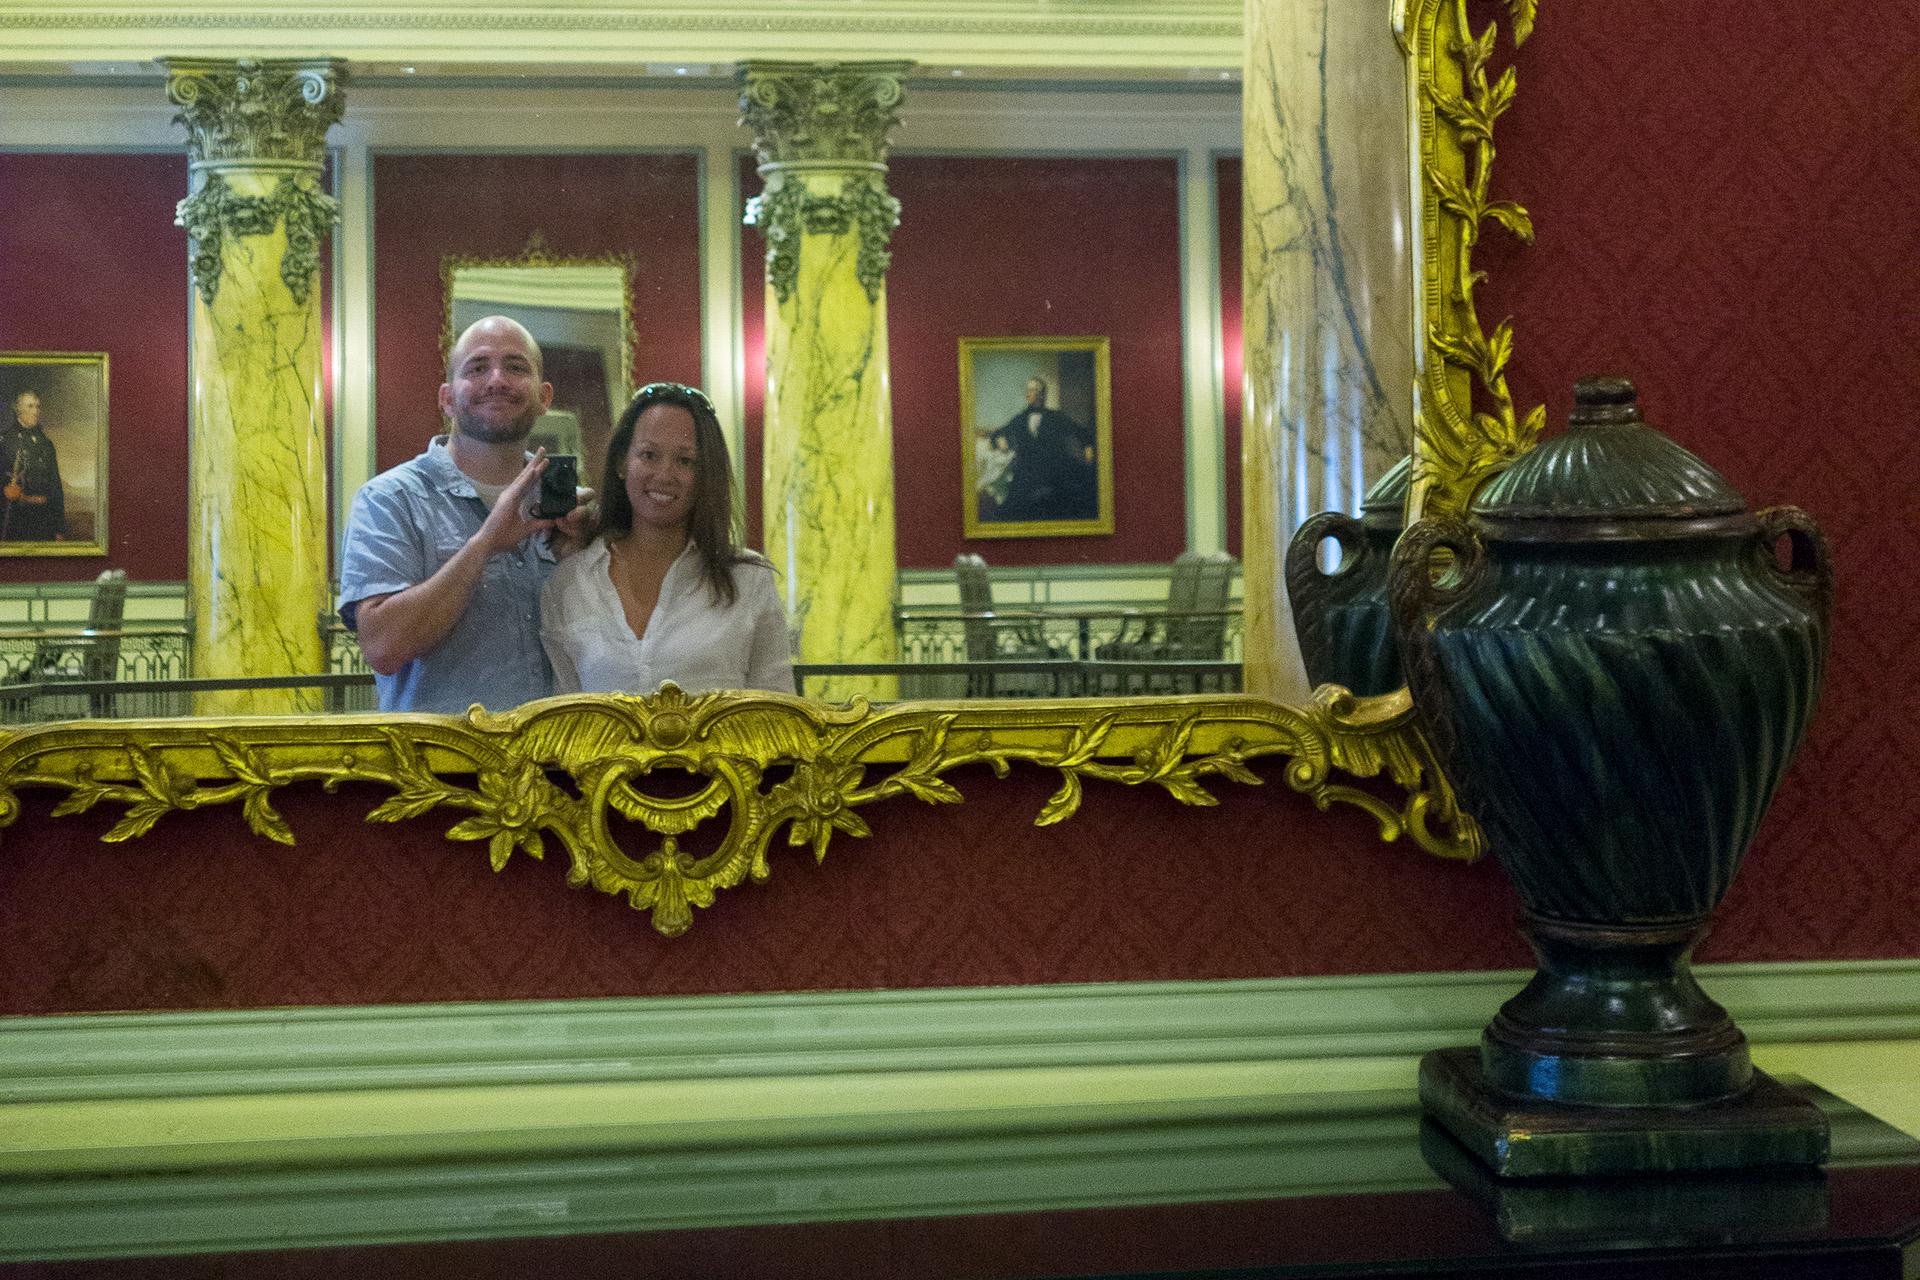 Matt and Heather in the Jefferson Hotel.